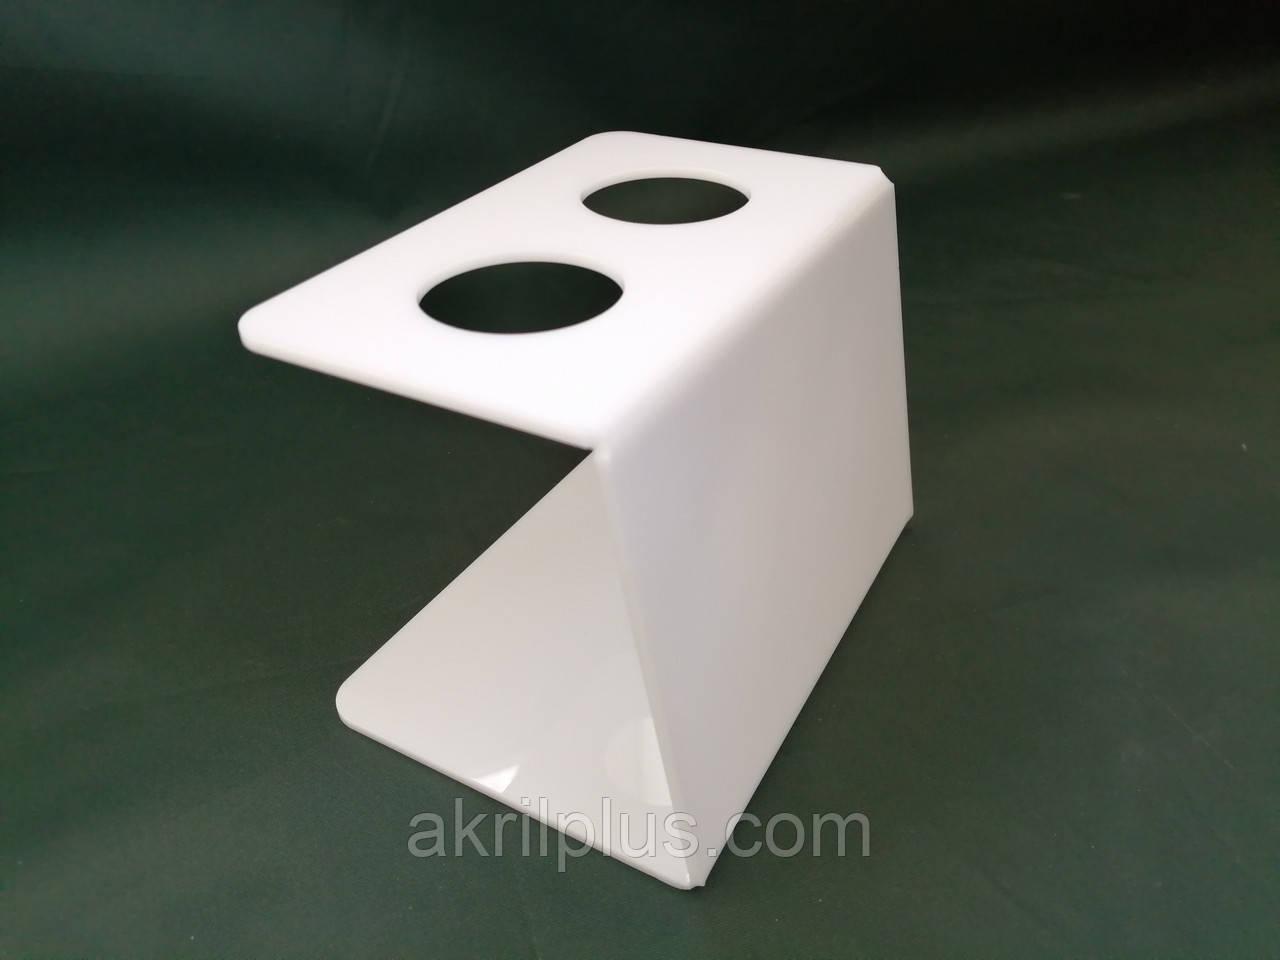 Подставка белая под мороженое на 2 рожка